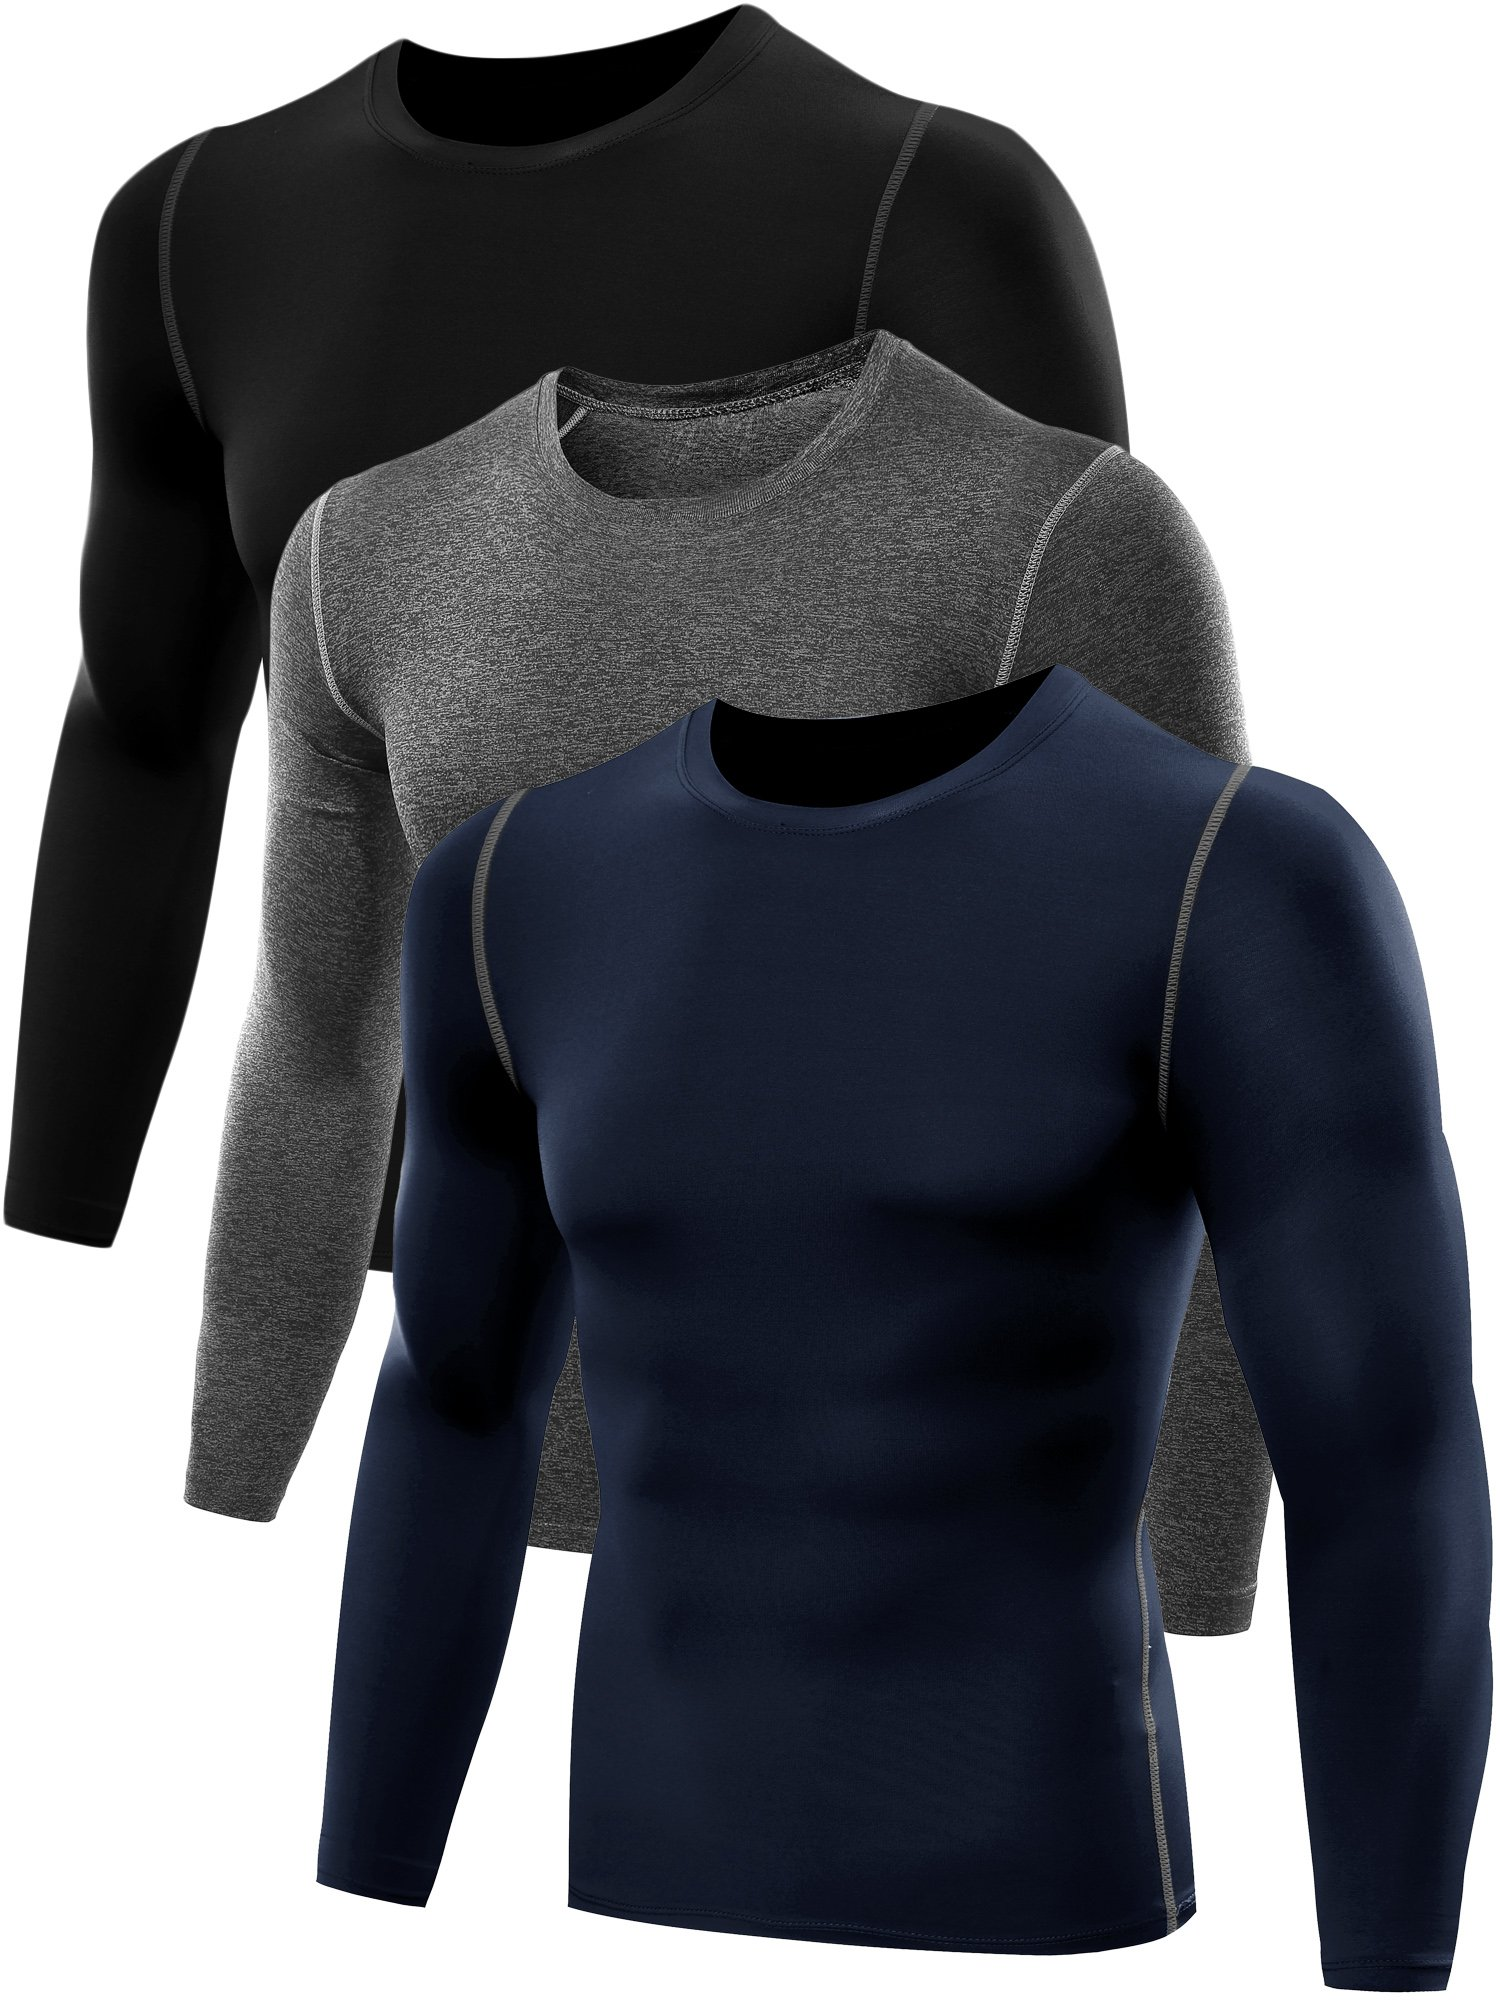 Neleus Men's 3 Pack Athletic Compression Long Sleeve Shirt,008,Black,Grey,Navy Blue,US S,EU M by Neleus